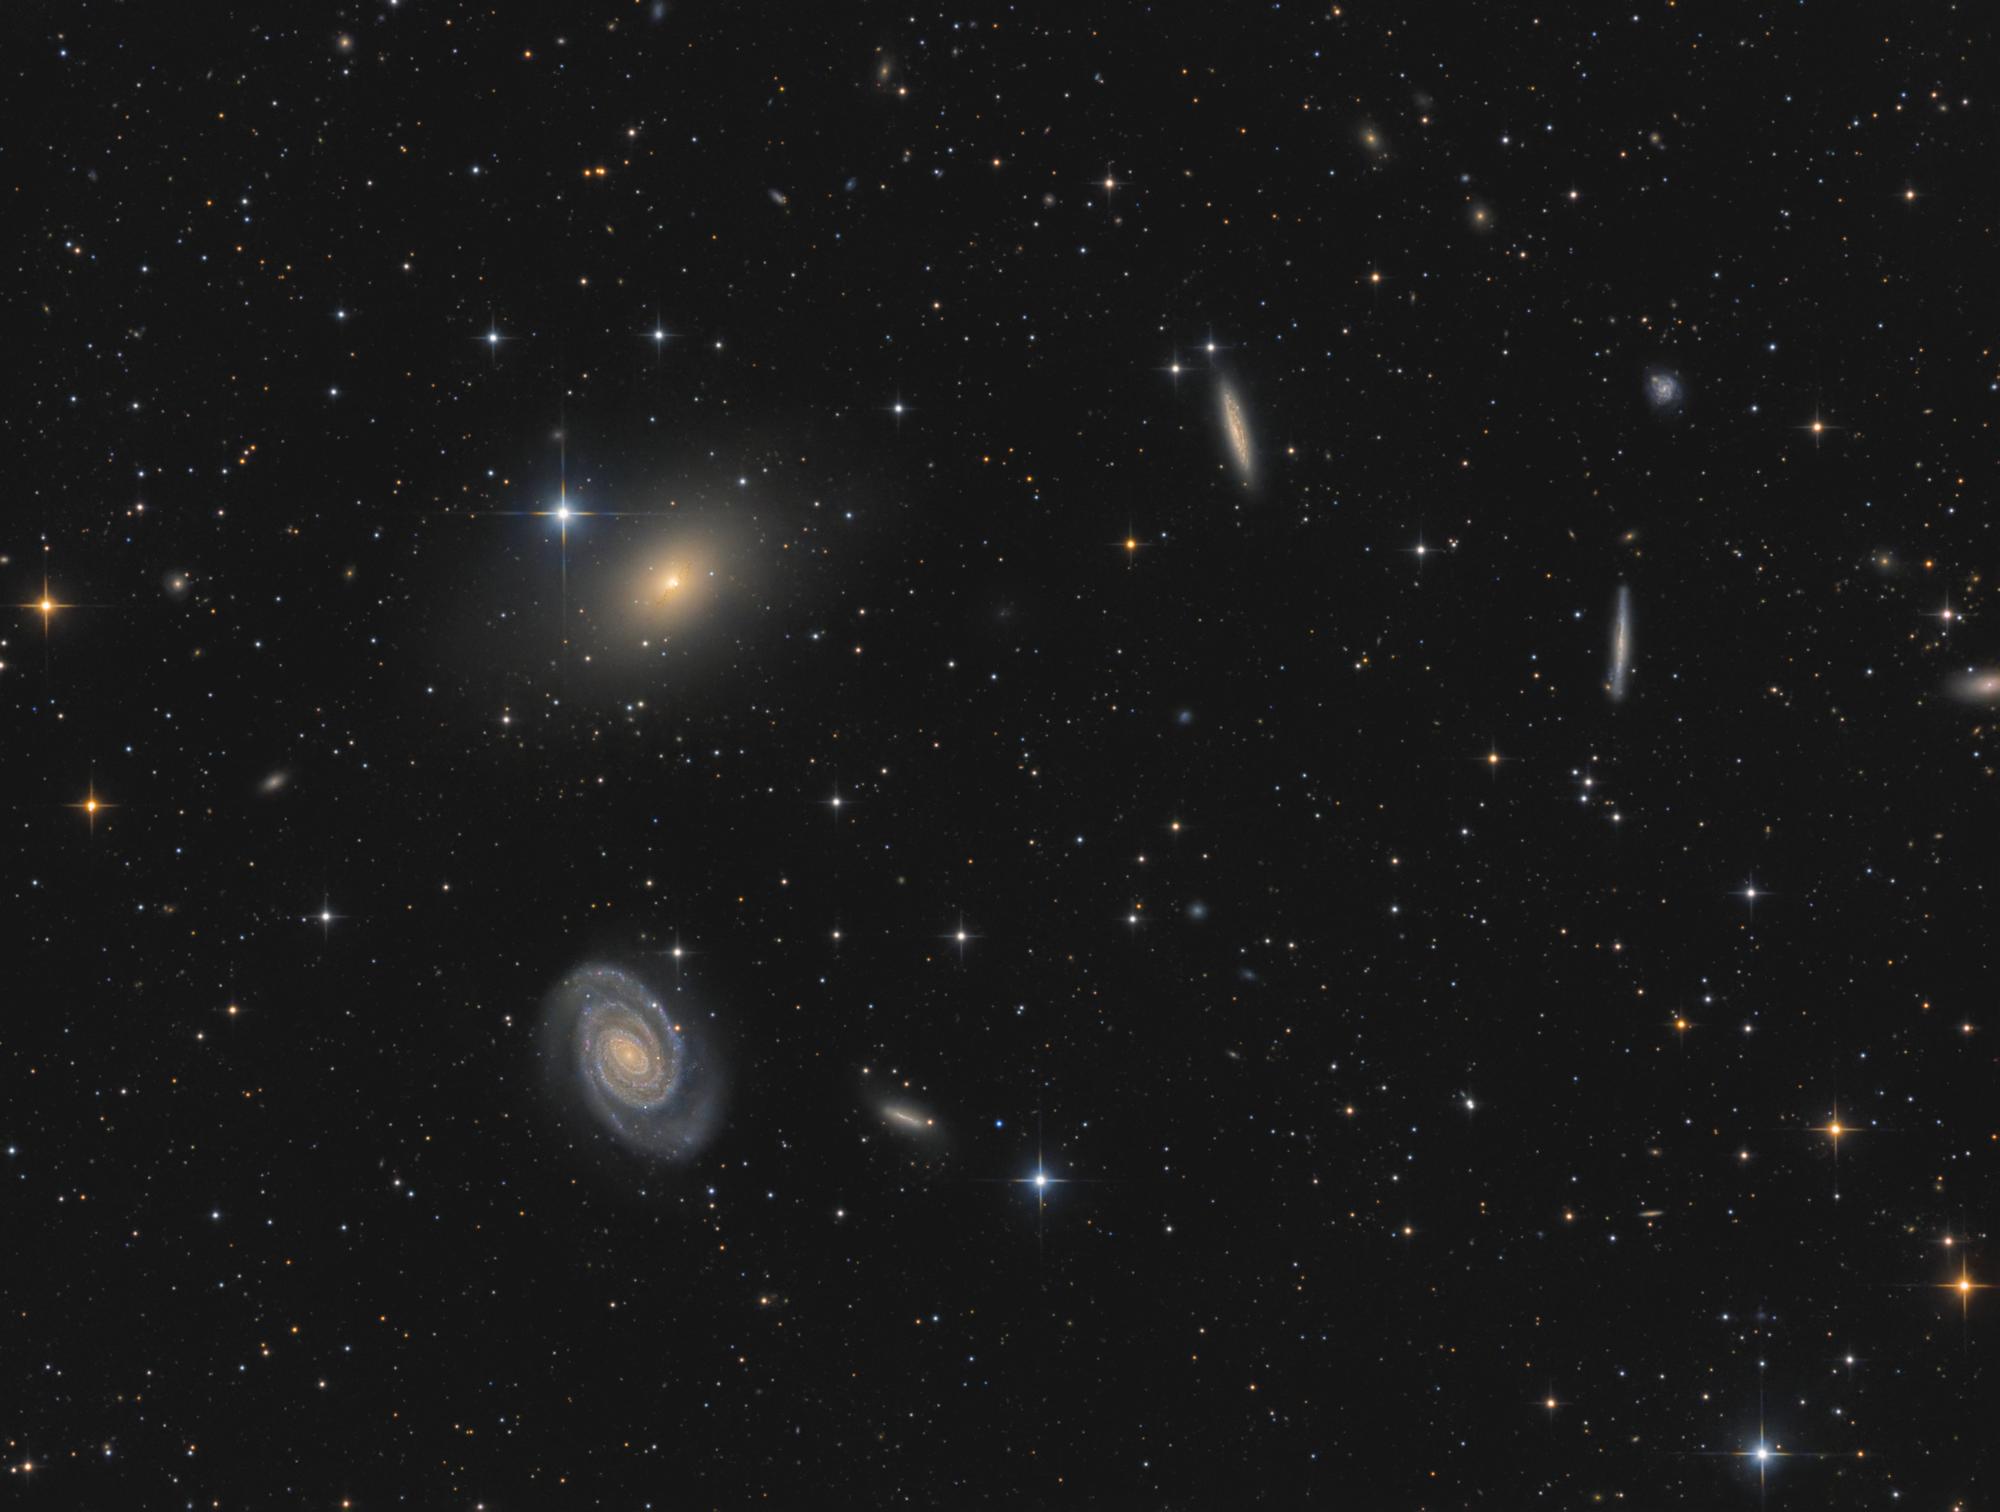 Galaxiengruppe NGC 5363/64